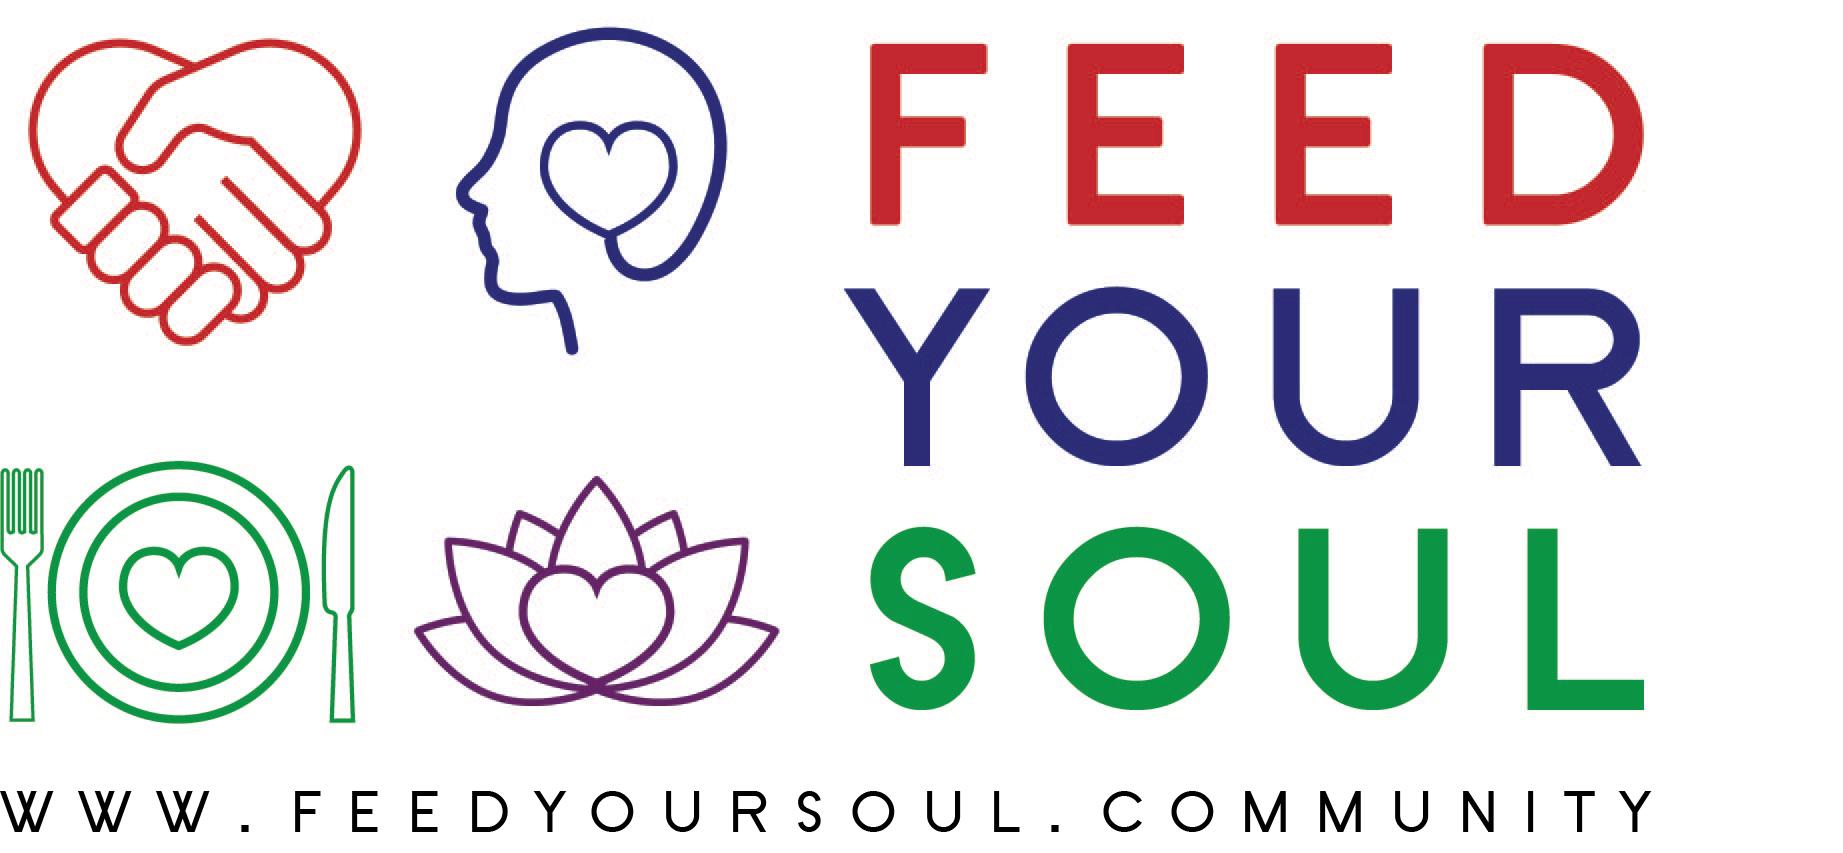 Feed Your Soul Logo_Video_RGB.jpg